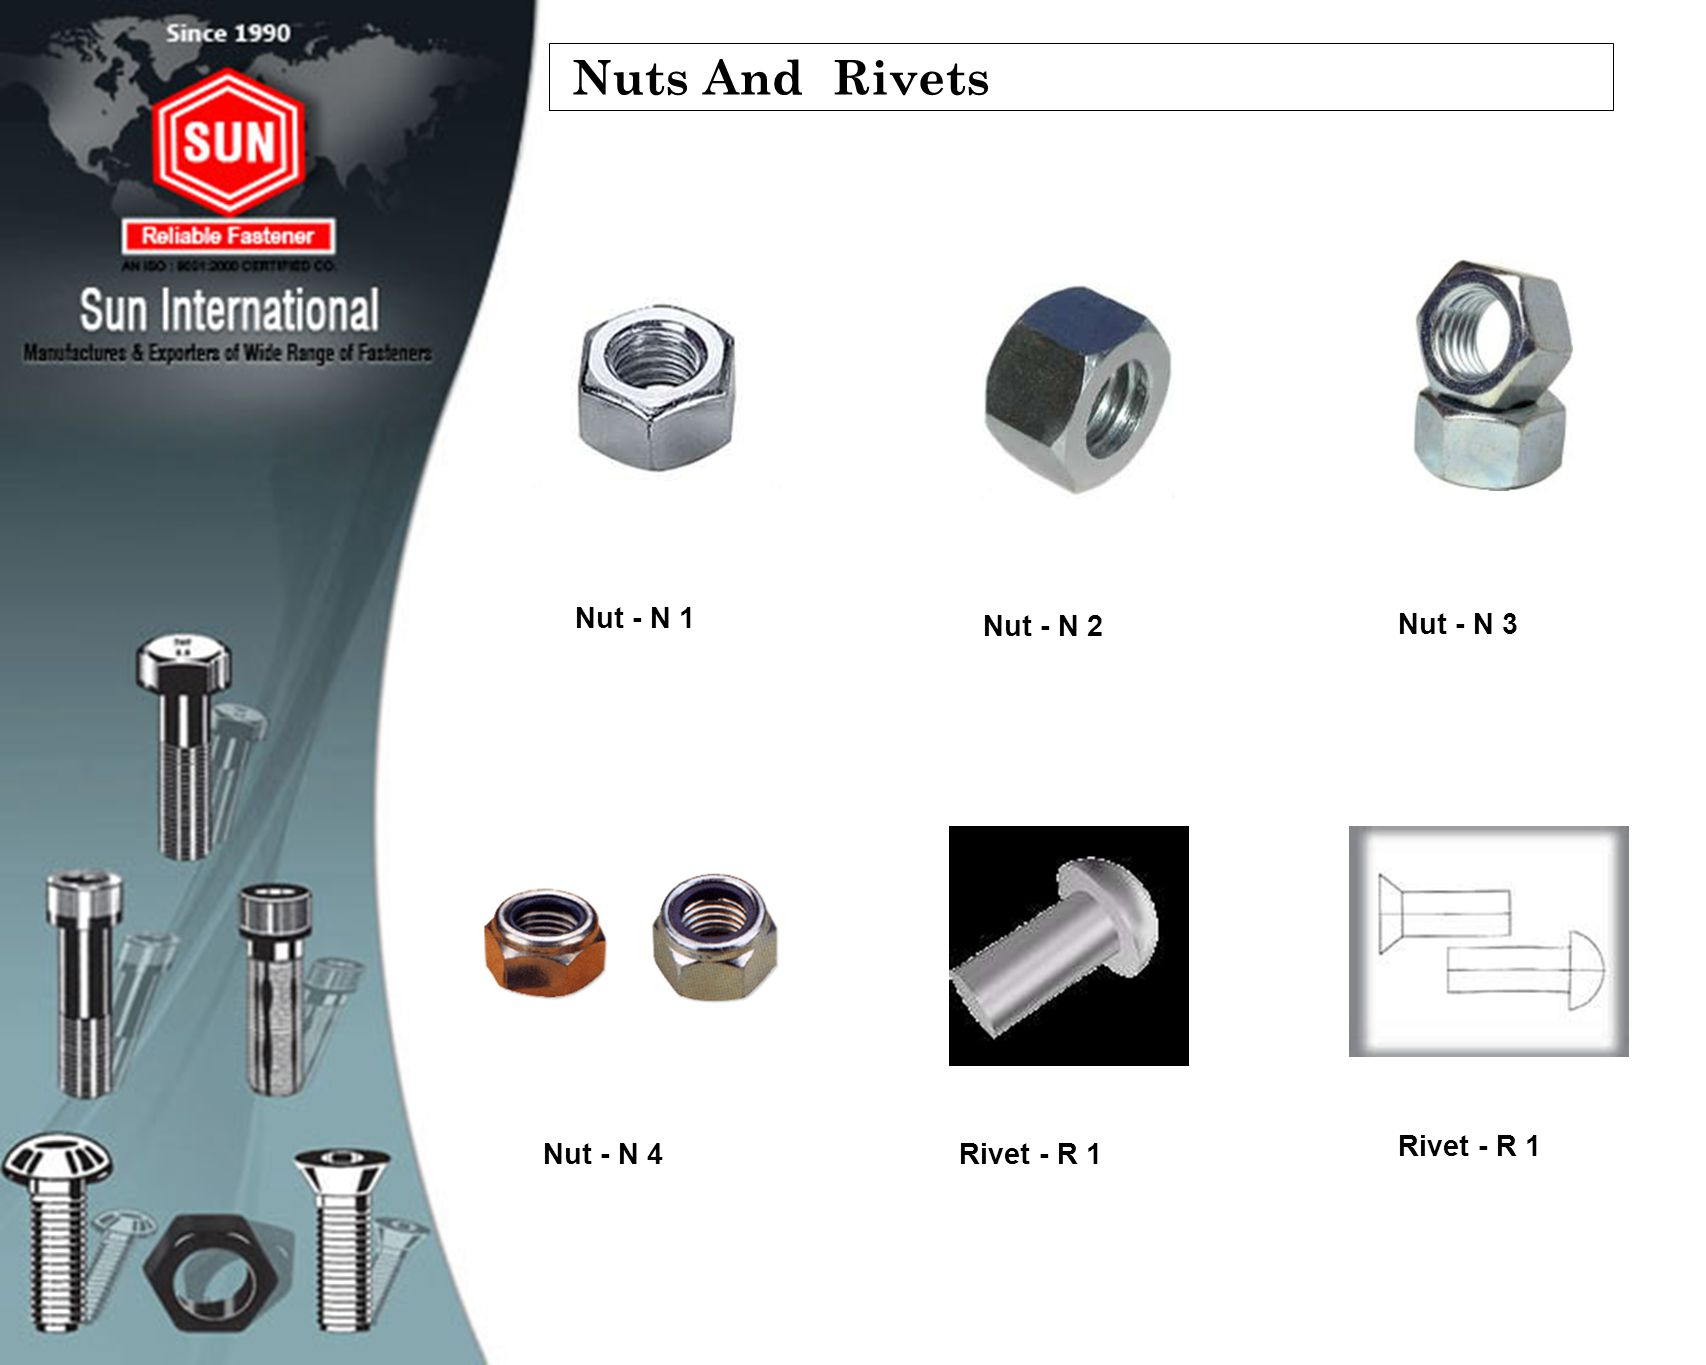 Nuts And Rivets Nut - N 1 Nut - N 2 Nut - N 3 Nut - N 4 Rivet - R 1